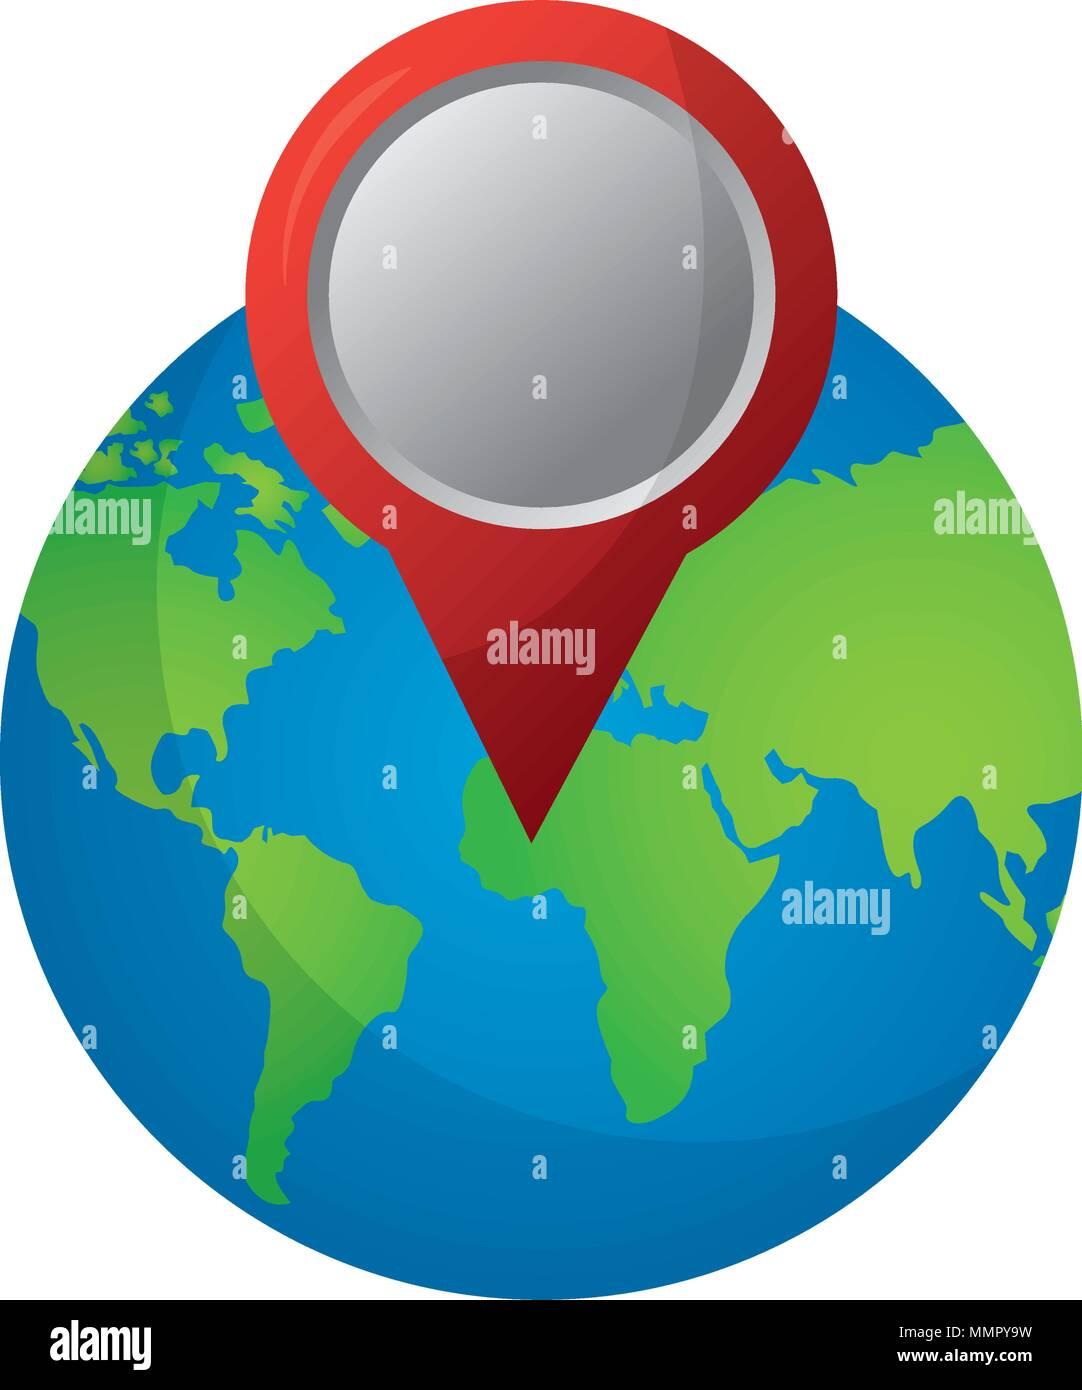 Map pin australia stock photos map pin australia stock images gps navigation world map pin destination travel vector illustration stock image gumiabroncs Images